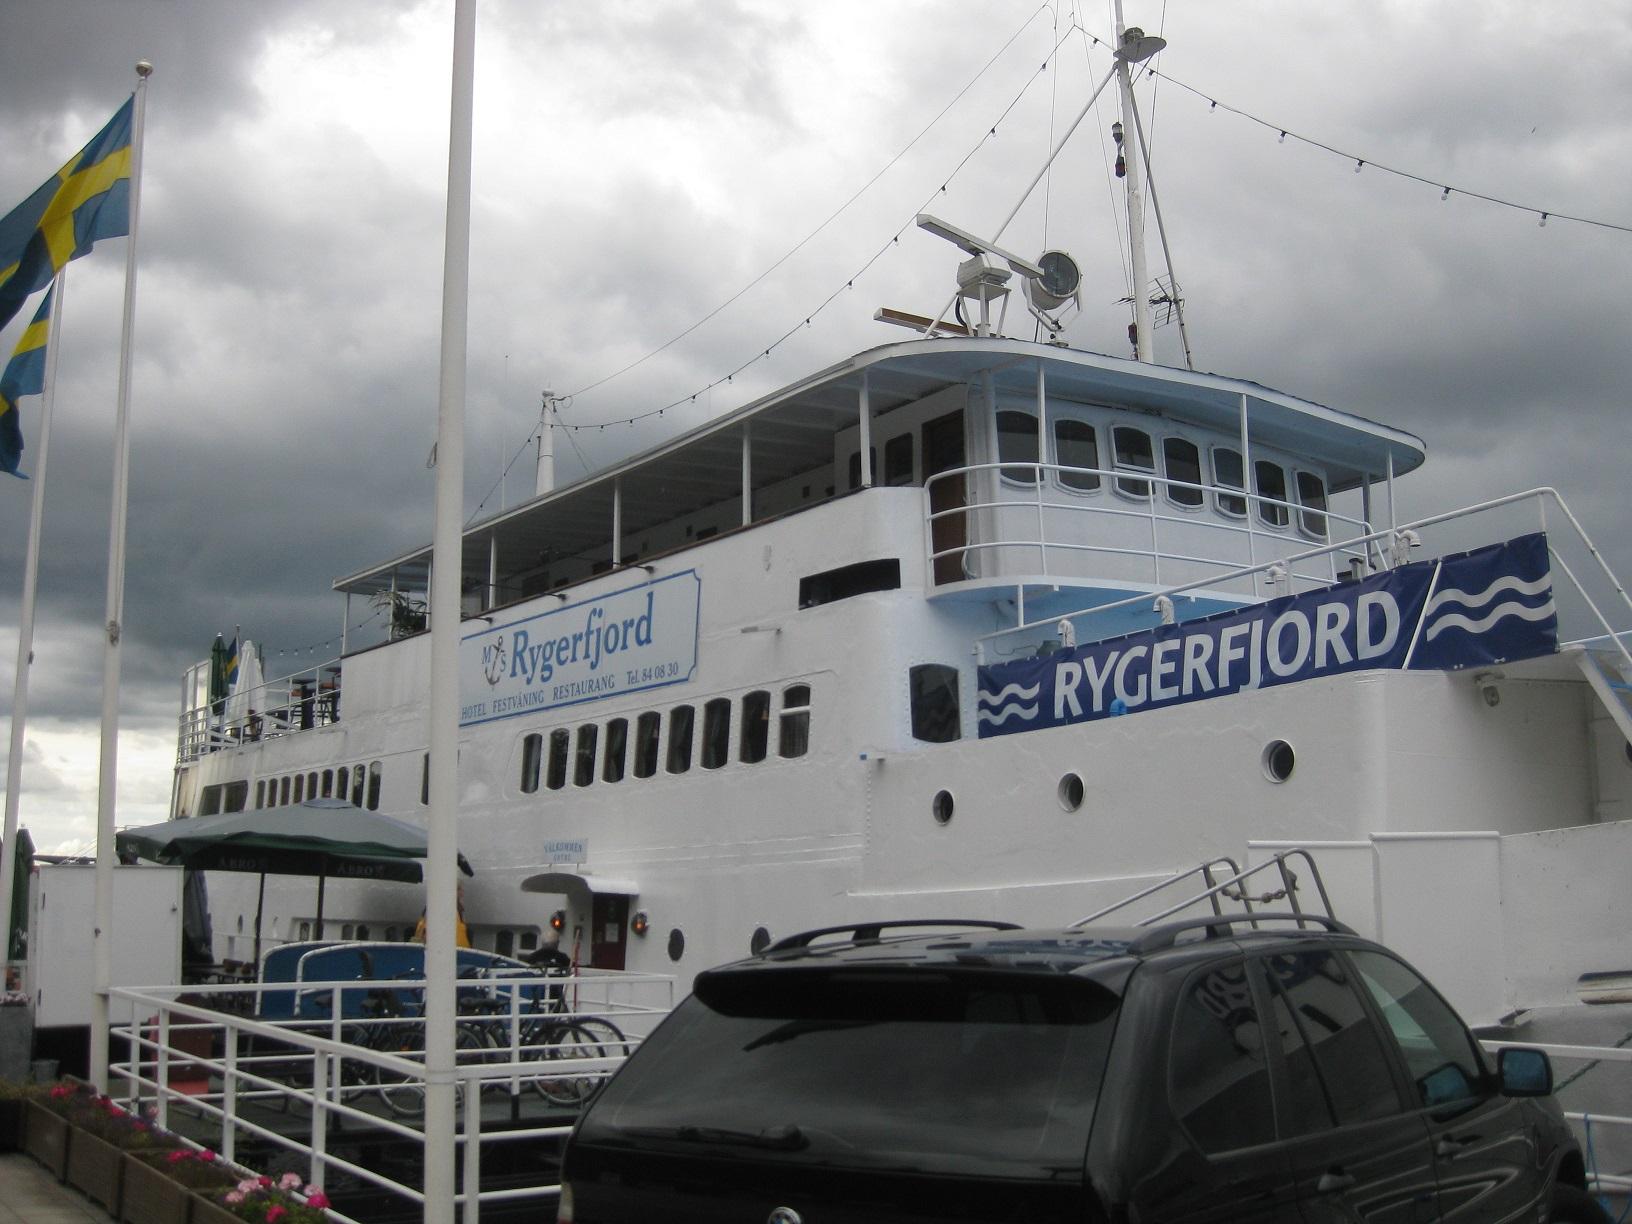 MS Rygerfjord Stockholm